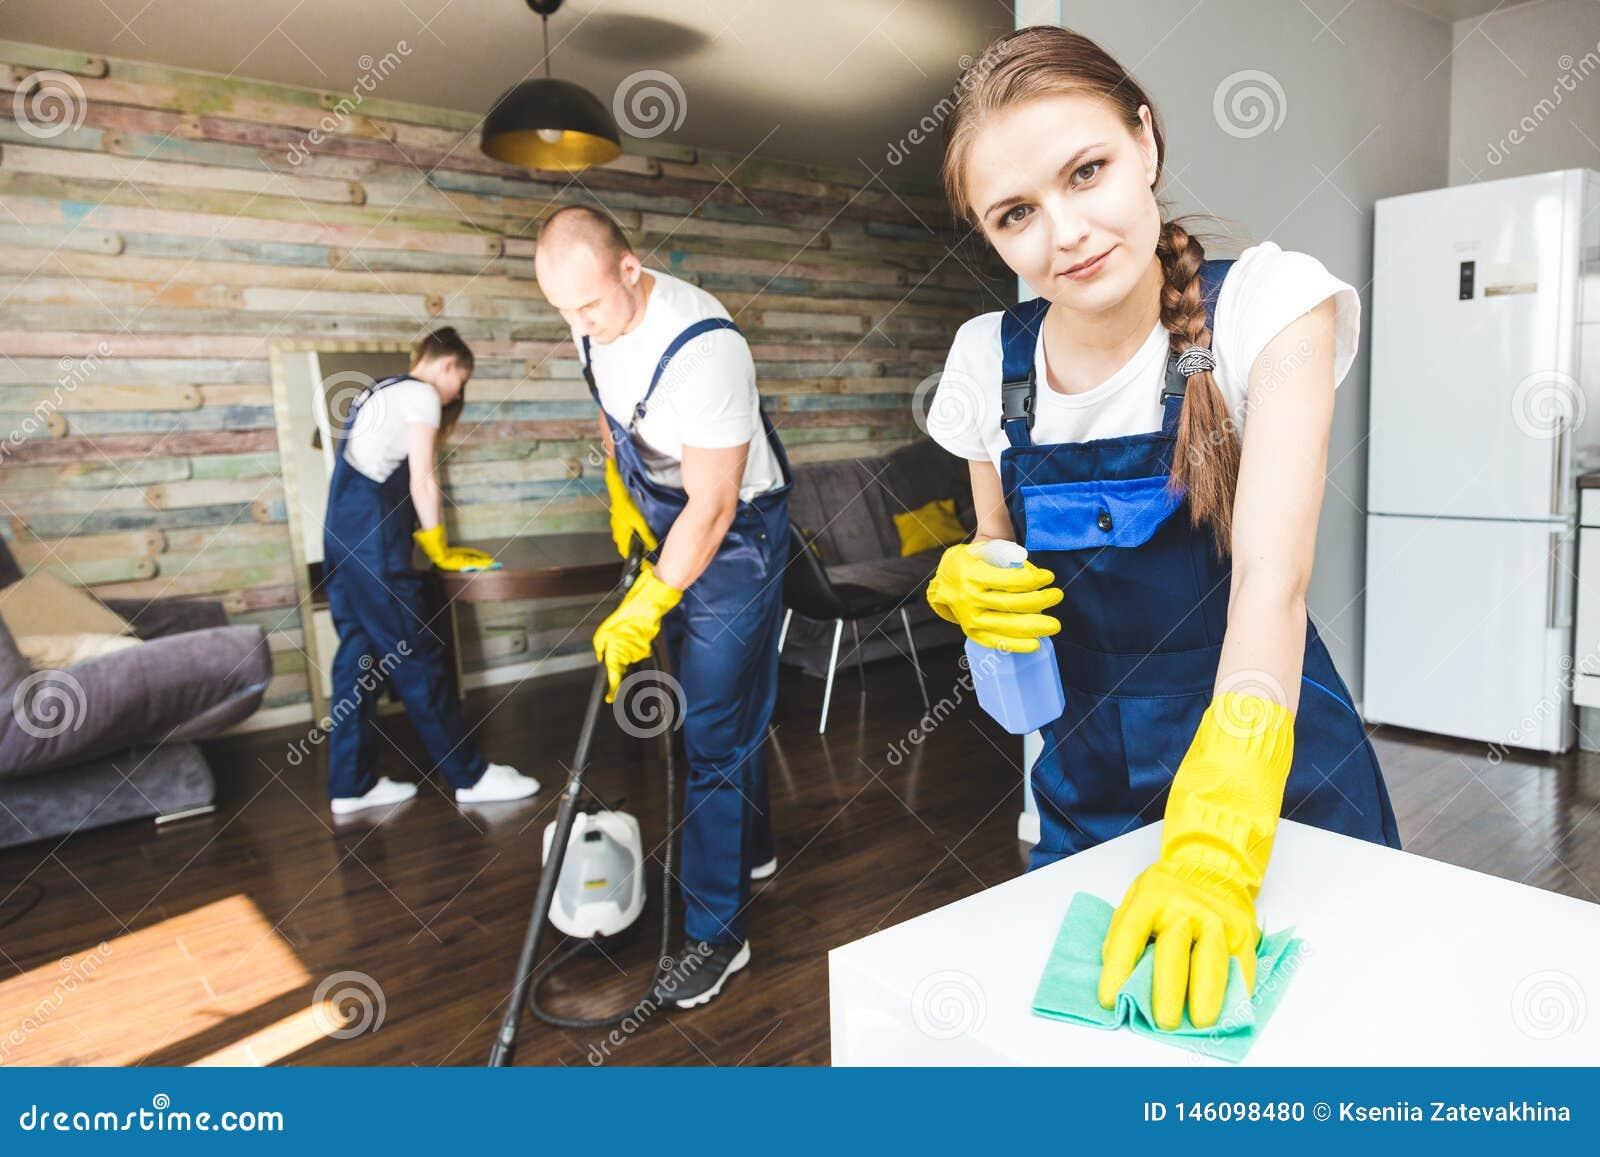 Servi?o da limpeza com equipamento profissional durante o trabalho limpeza profissional do kitchenette, tinturaria do sof?, janel